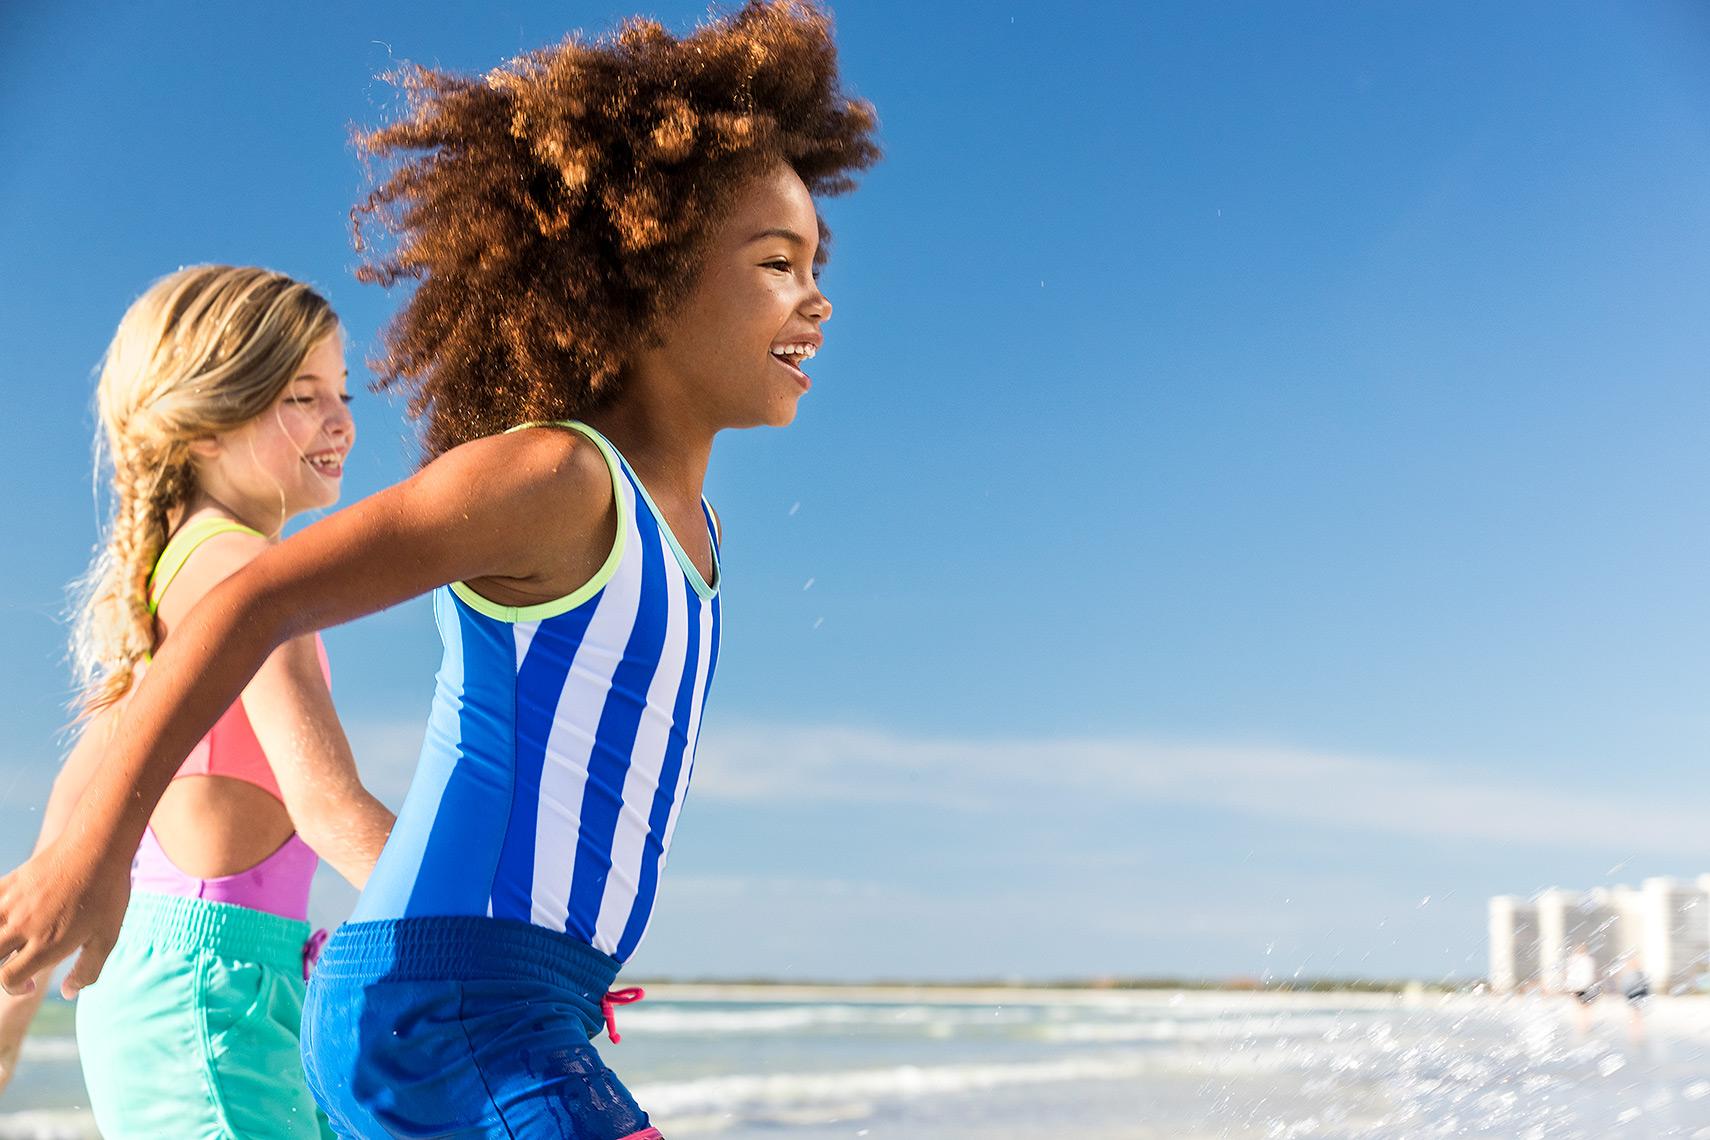 45_Beach_Walking_AA_Caucasian_Girls_Day5_24134-1.jpg